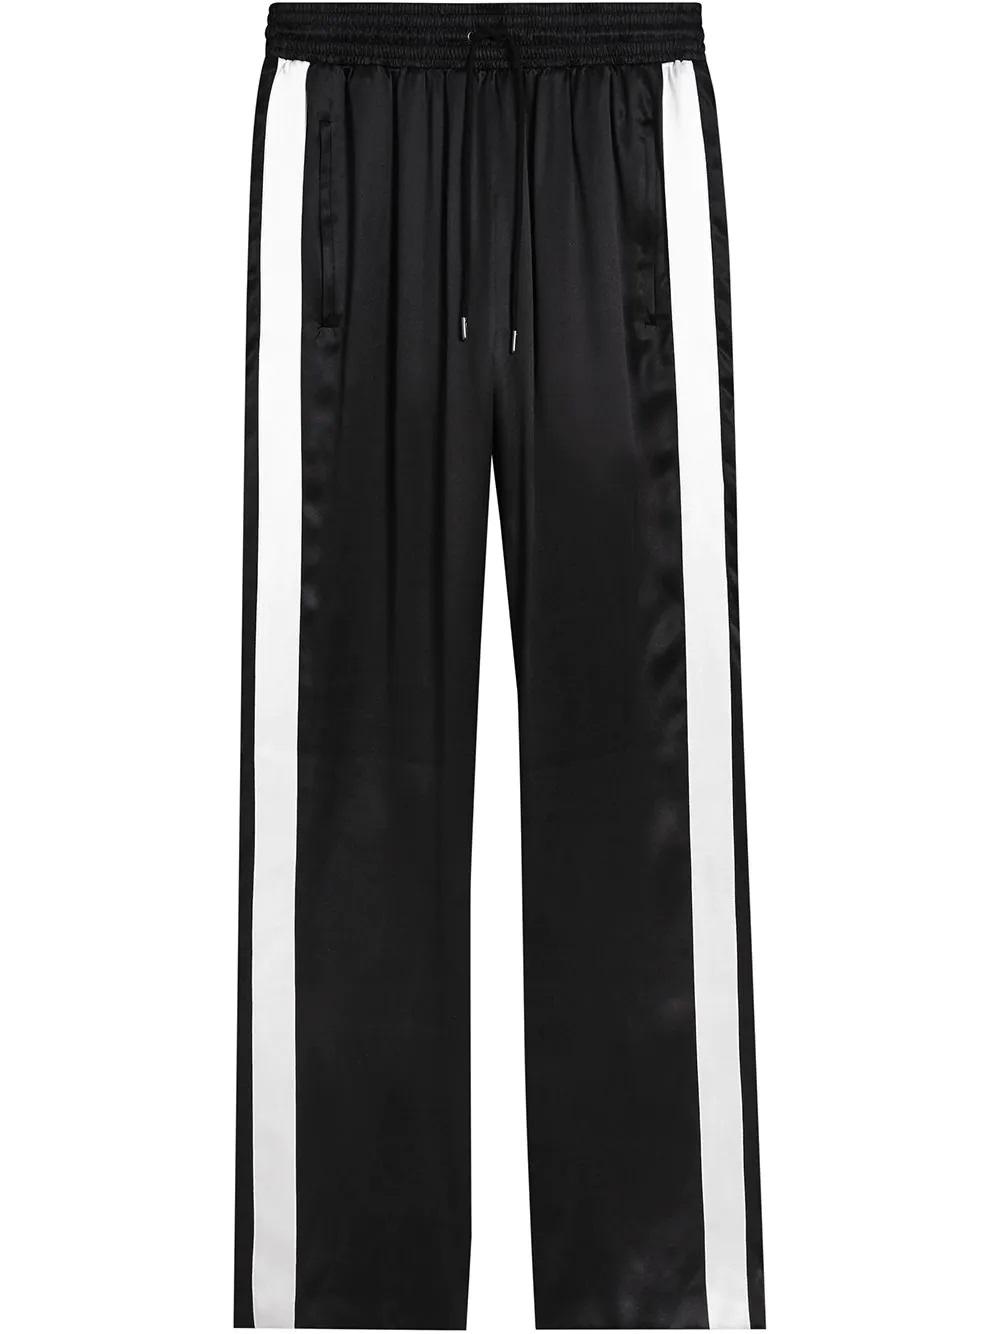 Burberry Ladies Black Side-stripe Straight Silk-satin Trousers